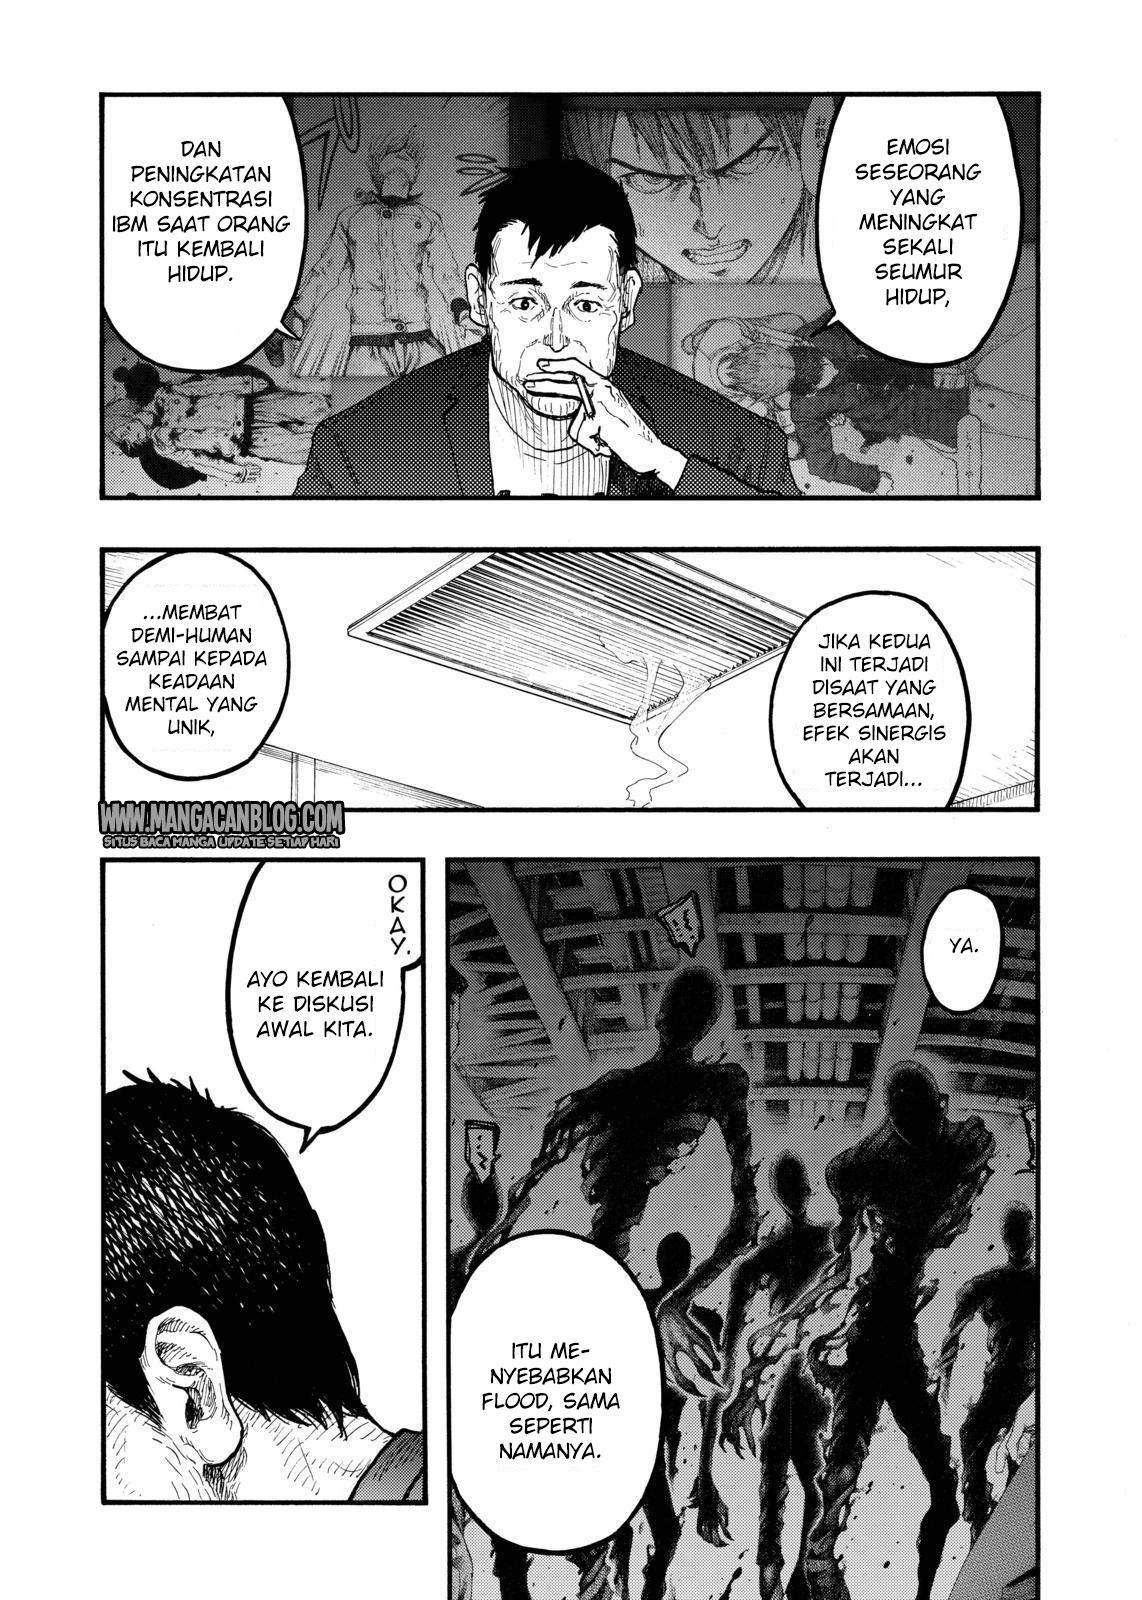 Dilarang COPAS - situs resmi www.mangacanblog.com - Komik ajin 046 - selamat pagi, sampai jumpa besok 47 Indonesia ajin 046 - selamat pagi, sampai jumpa besok Terbaru 25|Baca Manga Komik Indonesia|Mangacan